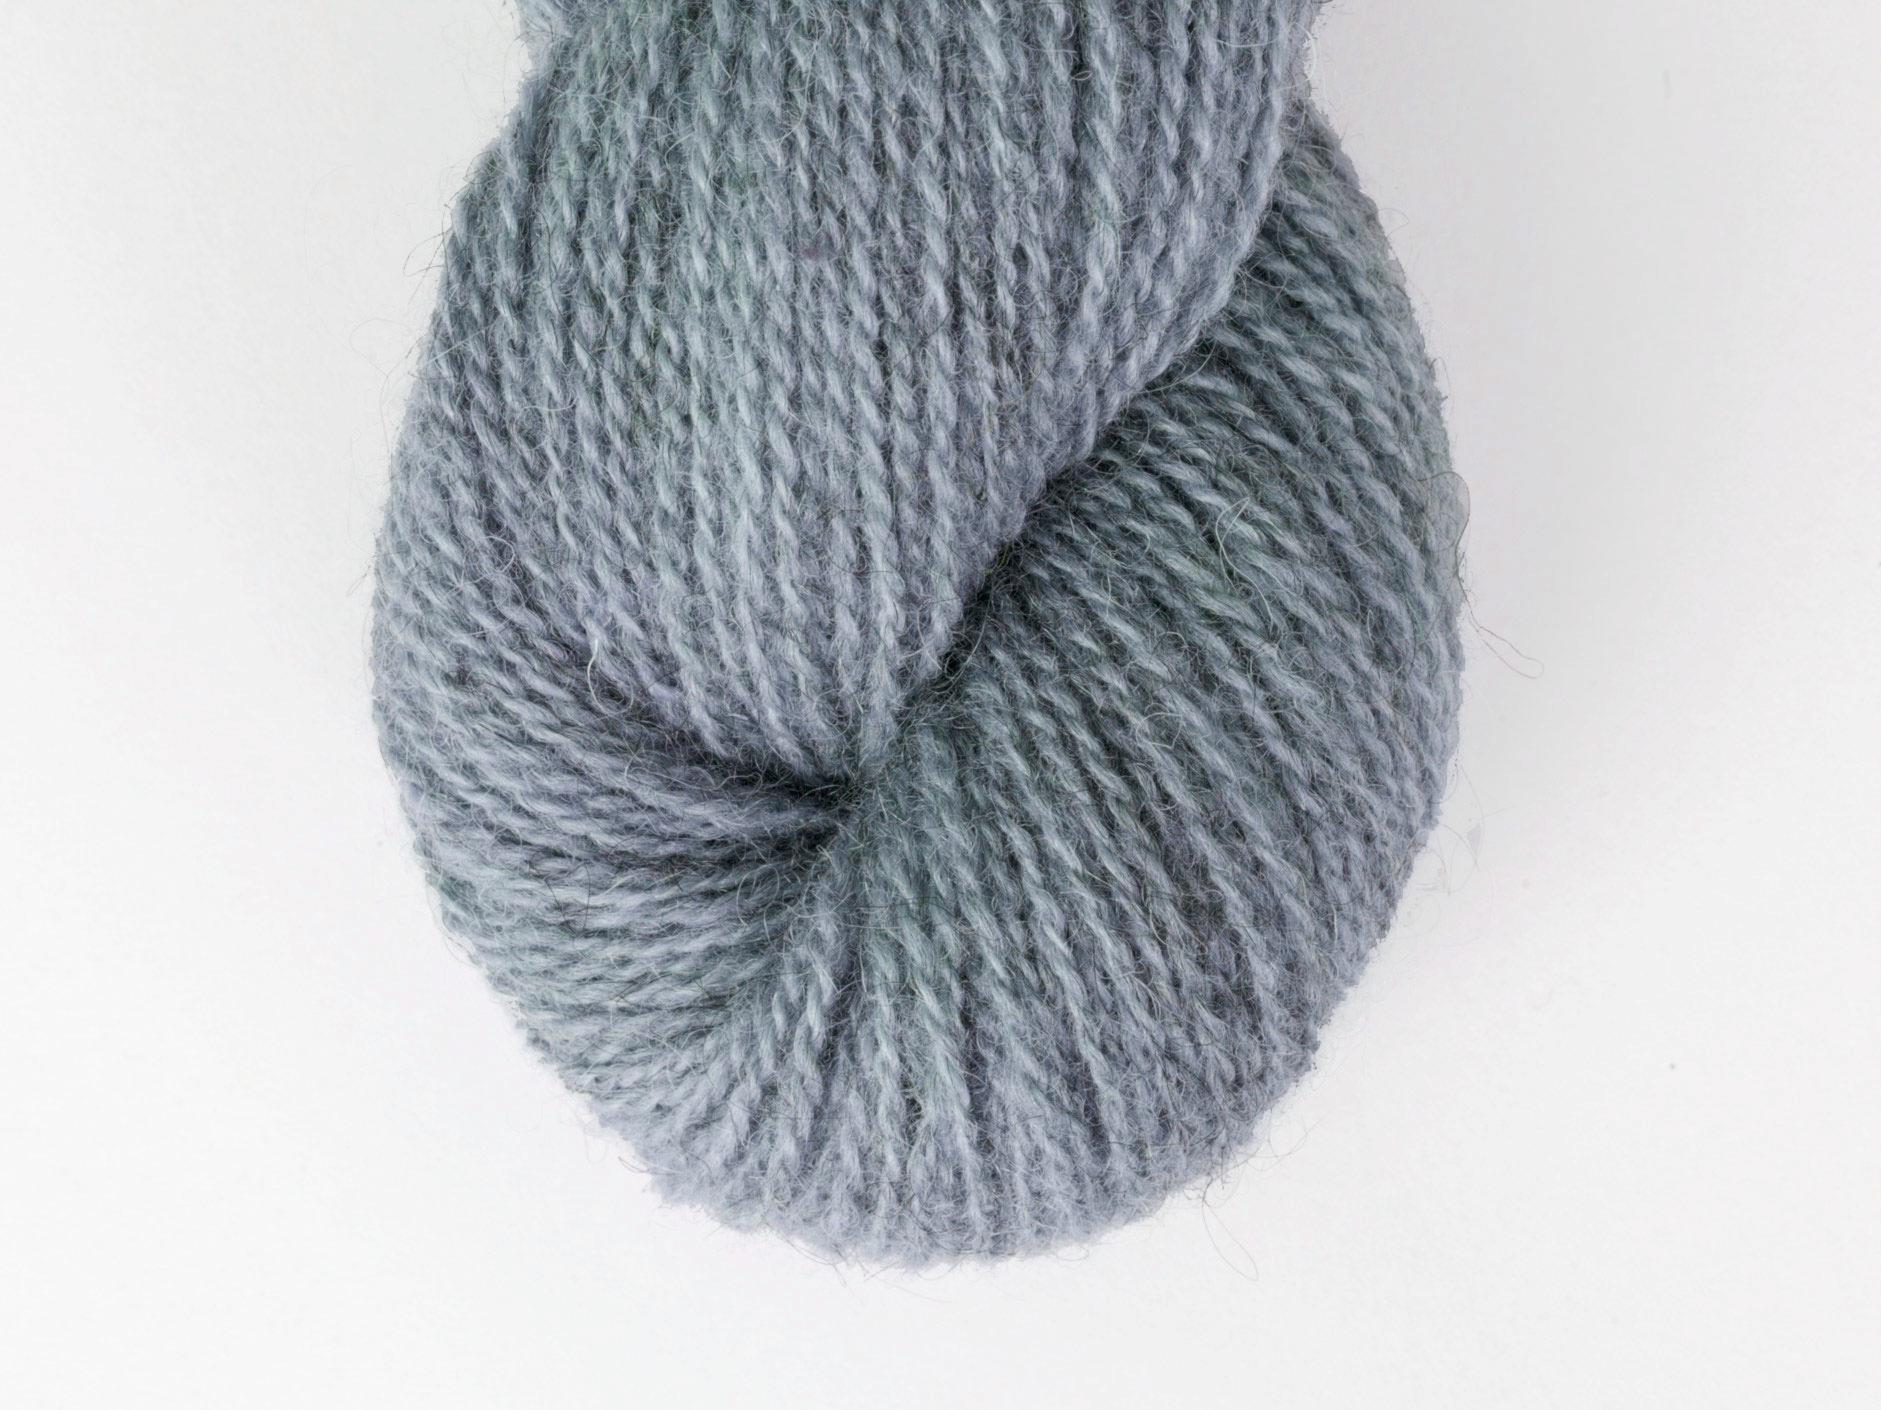 Bohus Stickning garn yarn BS 10 wool blue gray